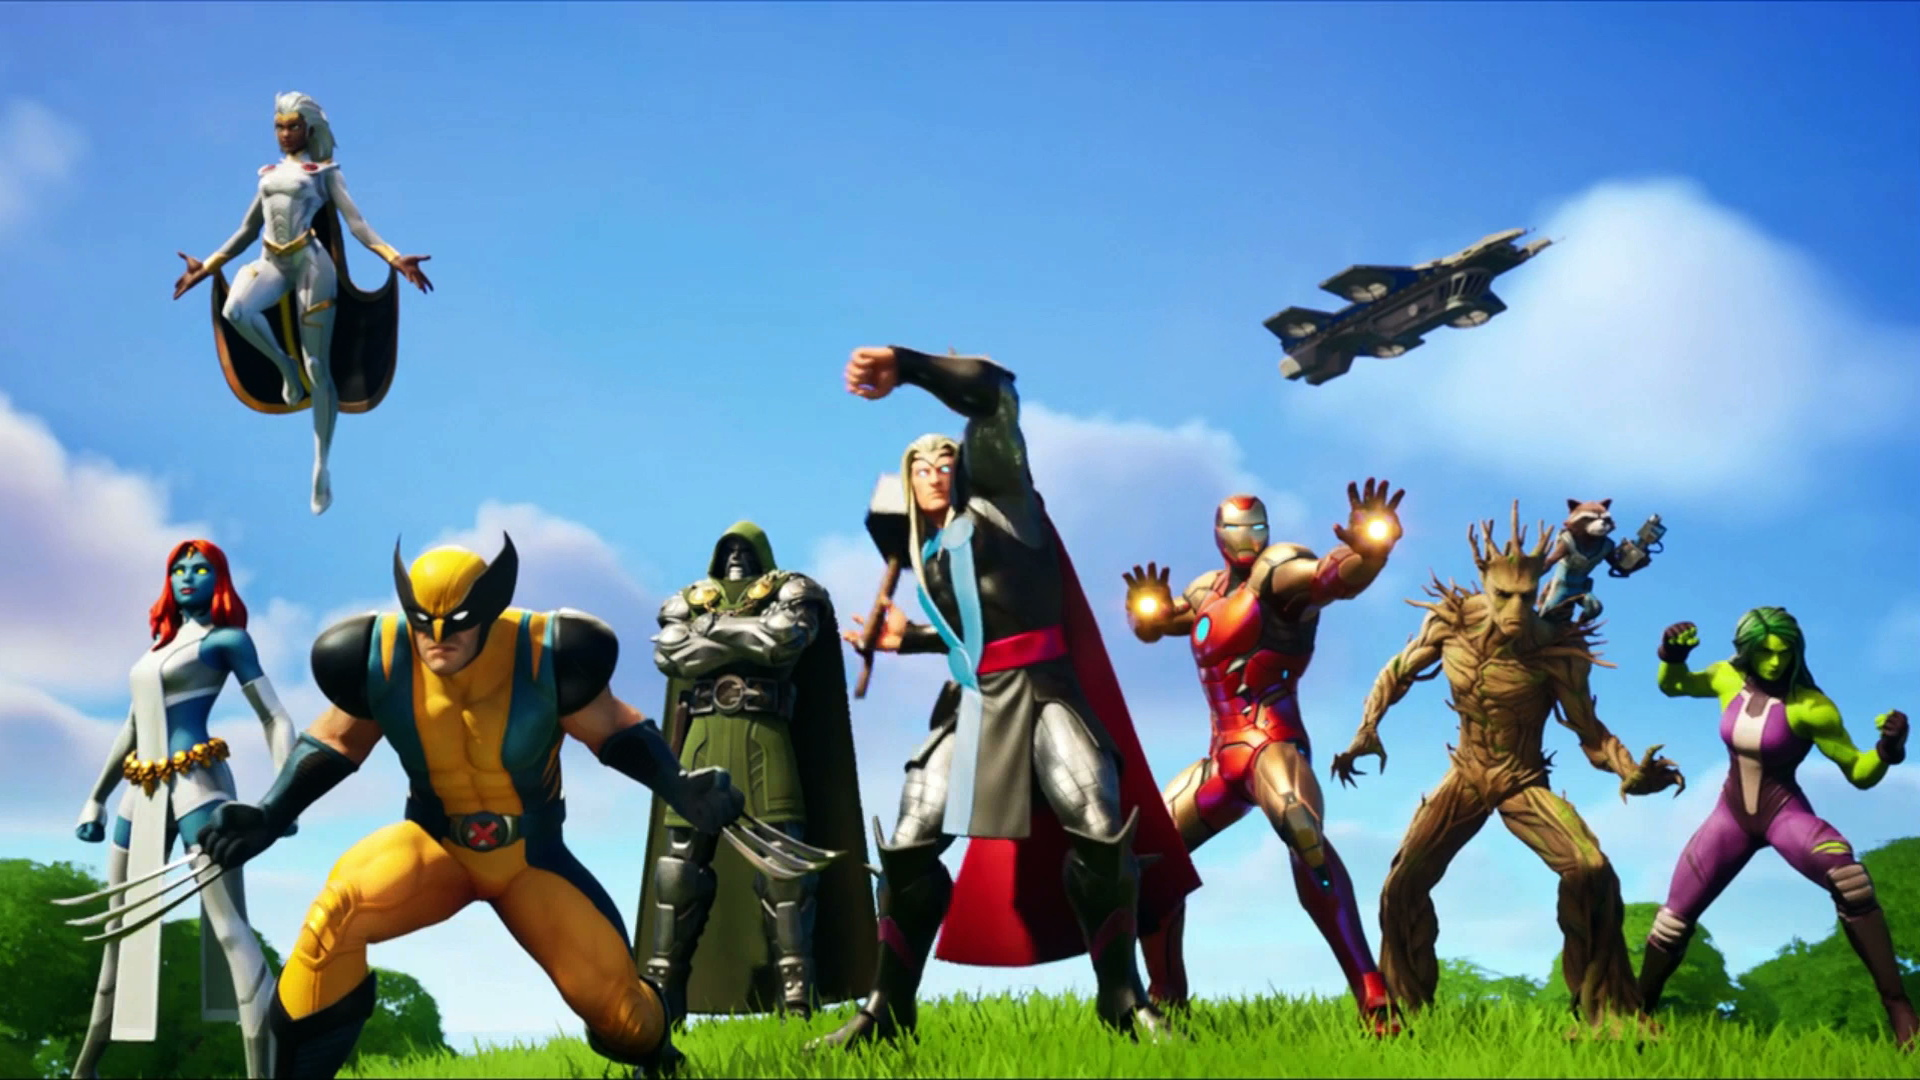 Fortnite Awakening Challenges How To Unlock Built In Emotes For All Of The Marvel Heroes Gamesradar